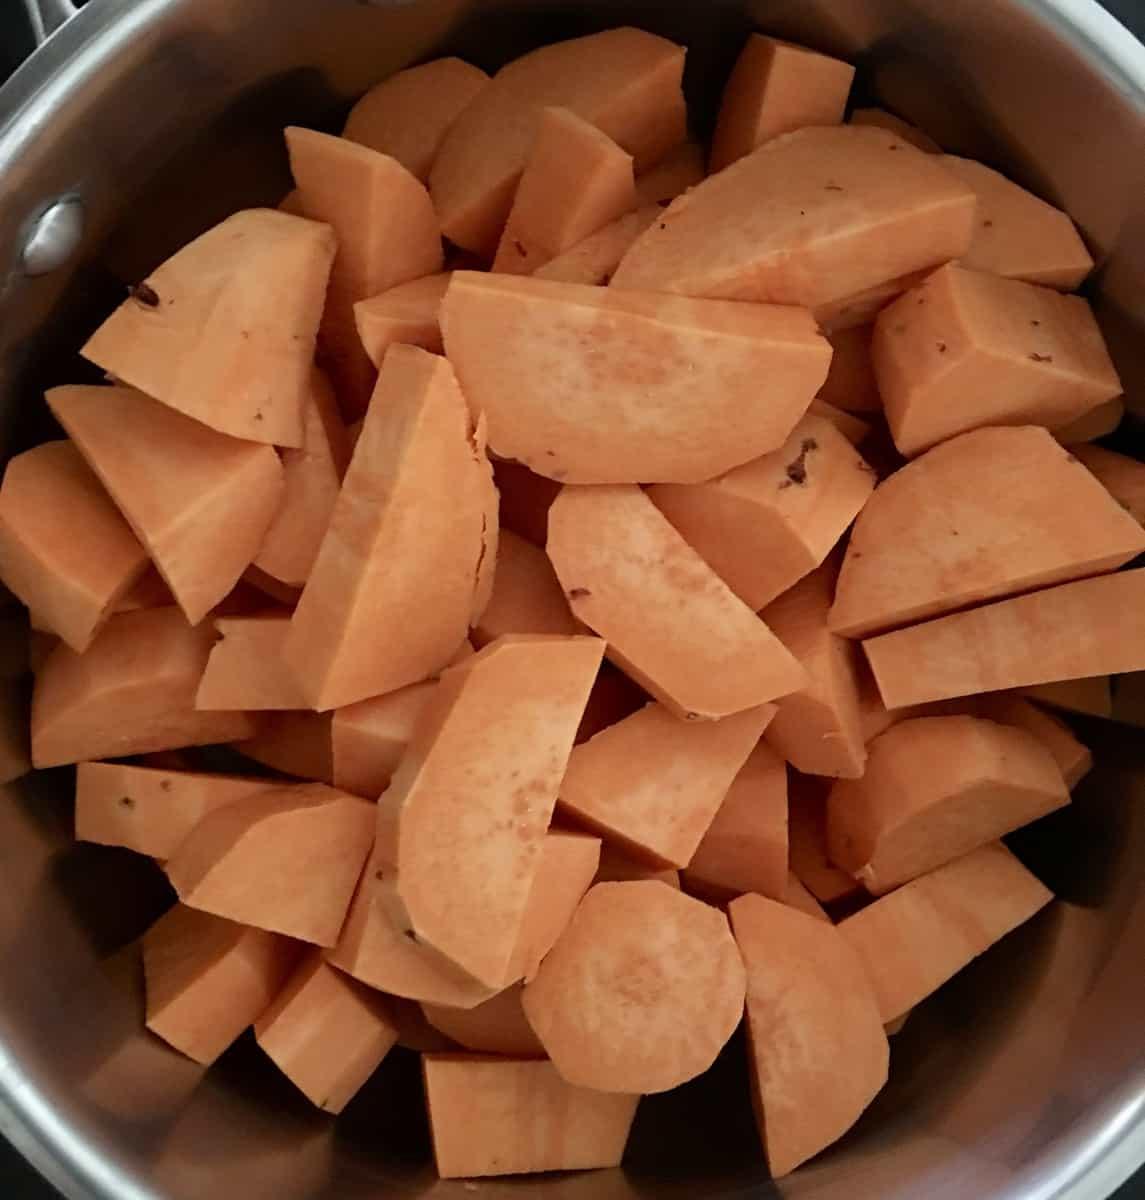 sweet potatoes cut in a bowl